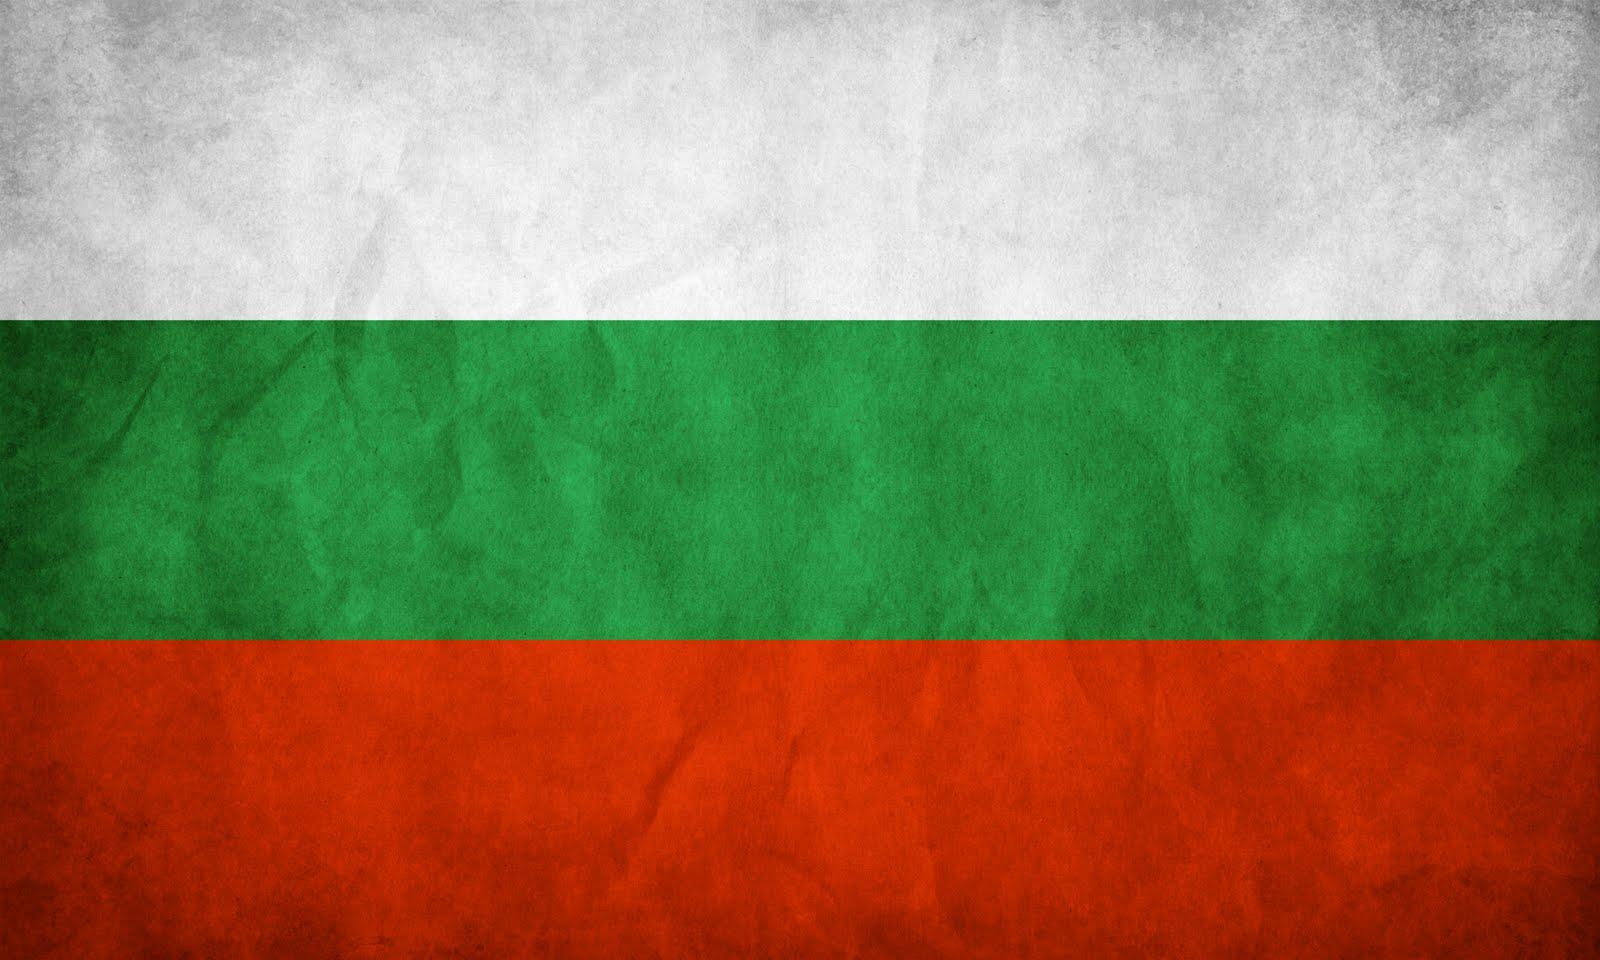 http://4.bp.blogspot.com/-lRT9oXJIpfs/TcnTubDPmFI/AAAAAAAAAzU/qmuG2CGDoeo/s1600/Wallpapers+Flag+of+Bulgaria+%25287%2529.jpg